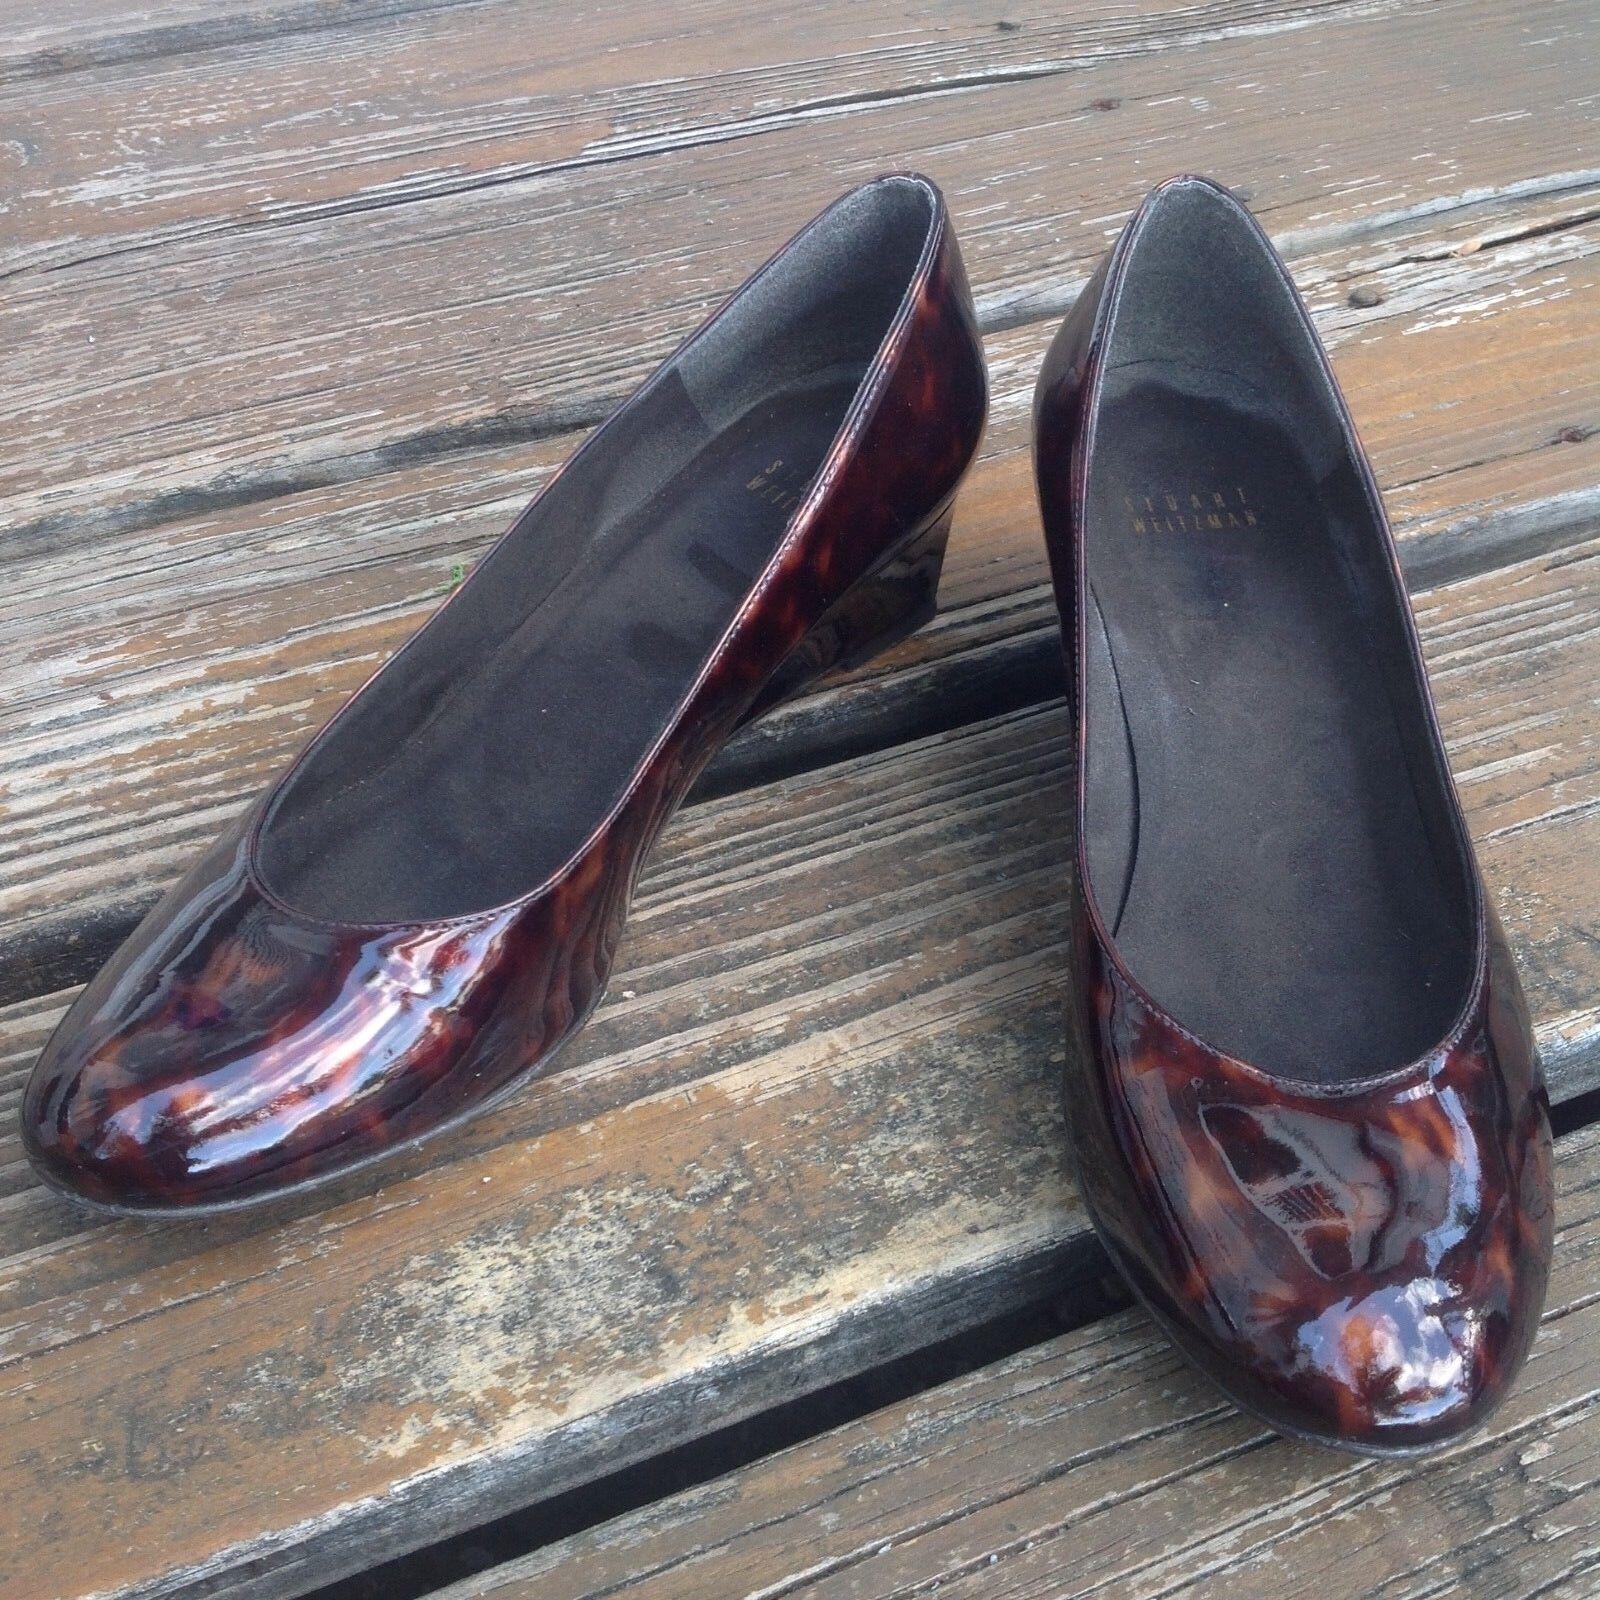 Stuart Weitzman Tortoise Marroneee Patent Leather Leather Leather Wedge Heels Sz 8.5 9 donna scarpe 2efa03